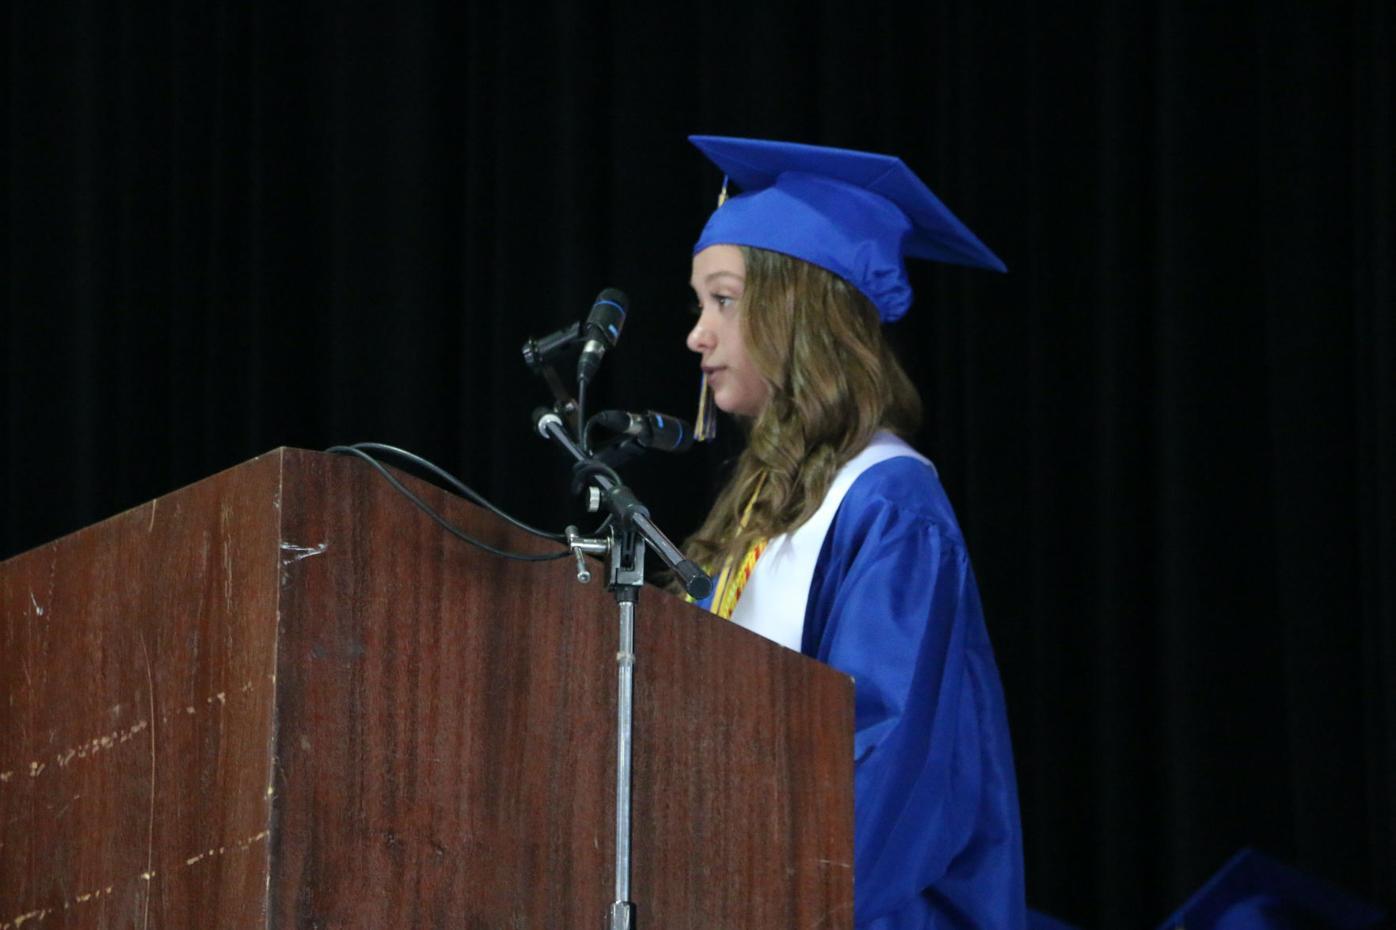 Northern valedictorian speaks